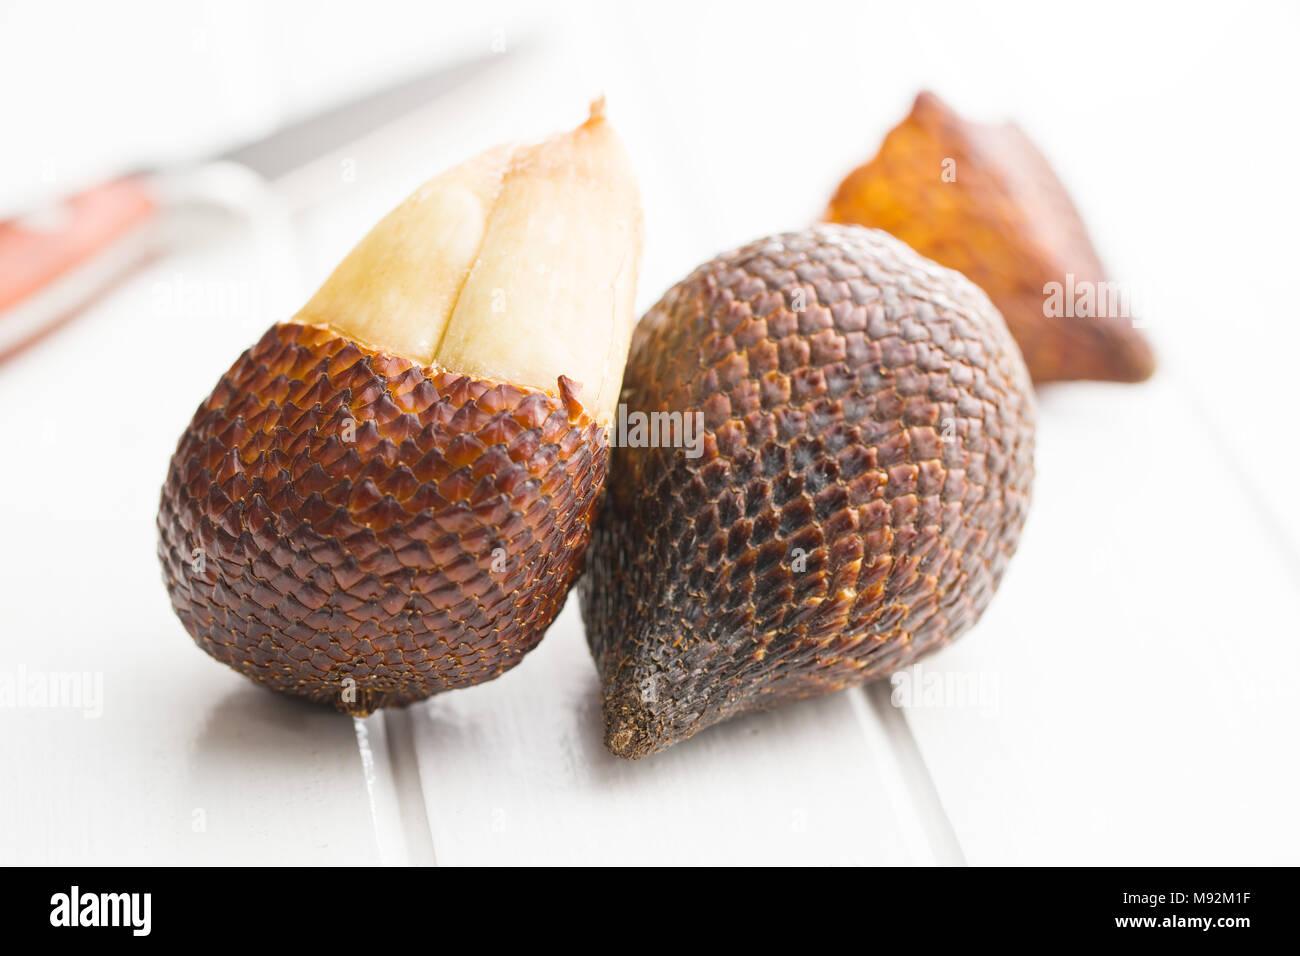 Salak fruit, Salacca zalacca, snake fruit. Tasty tropical fruit. - Stock Image